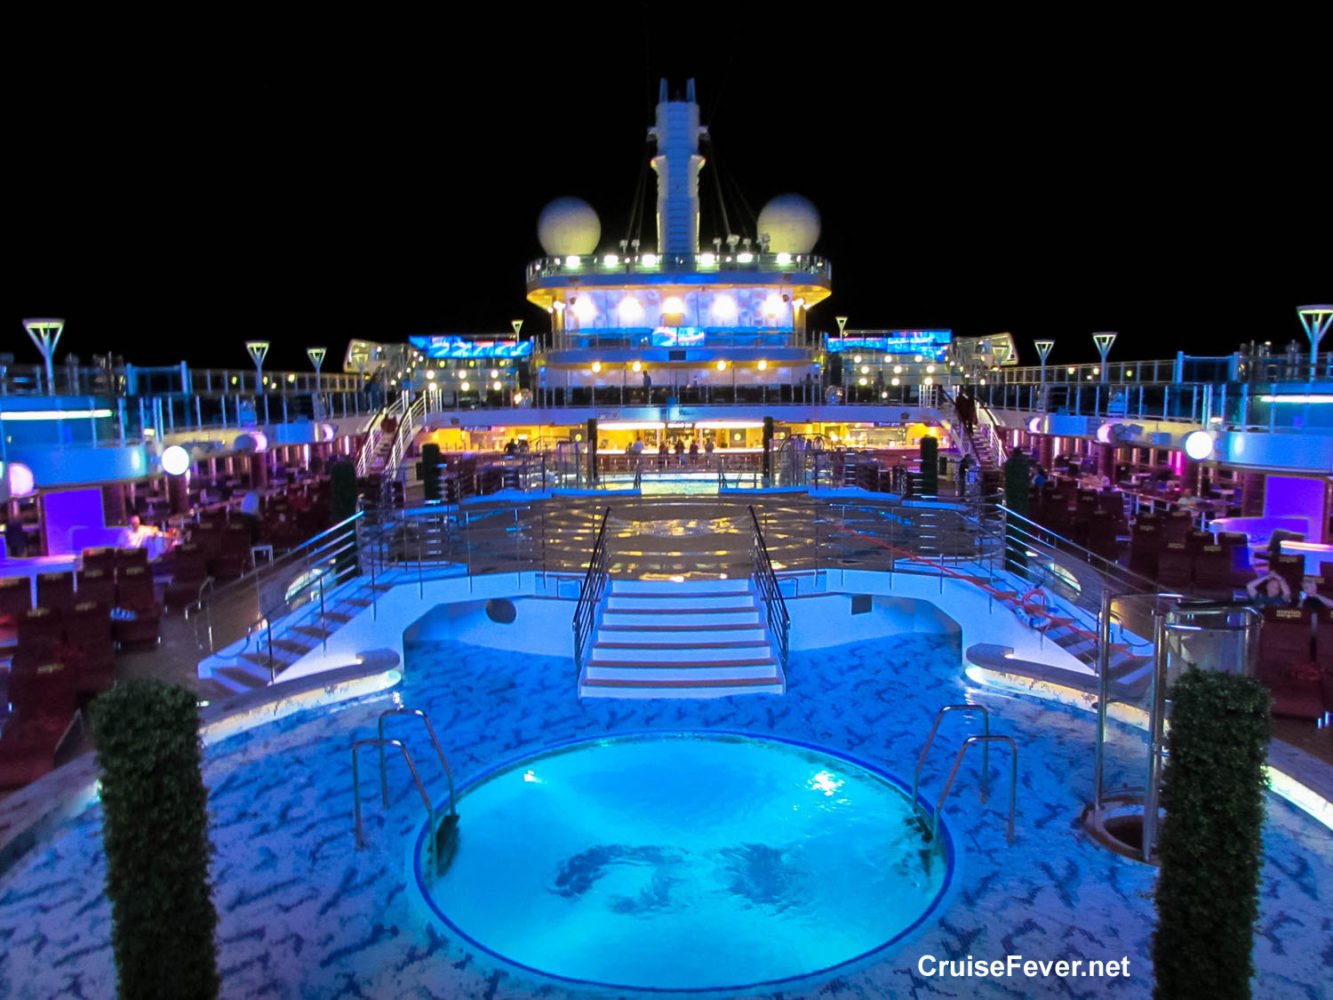 Royal Princess Cruise Ship Review and Video Tour